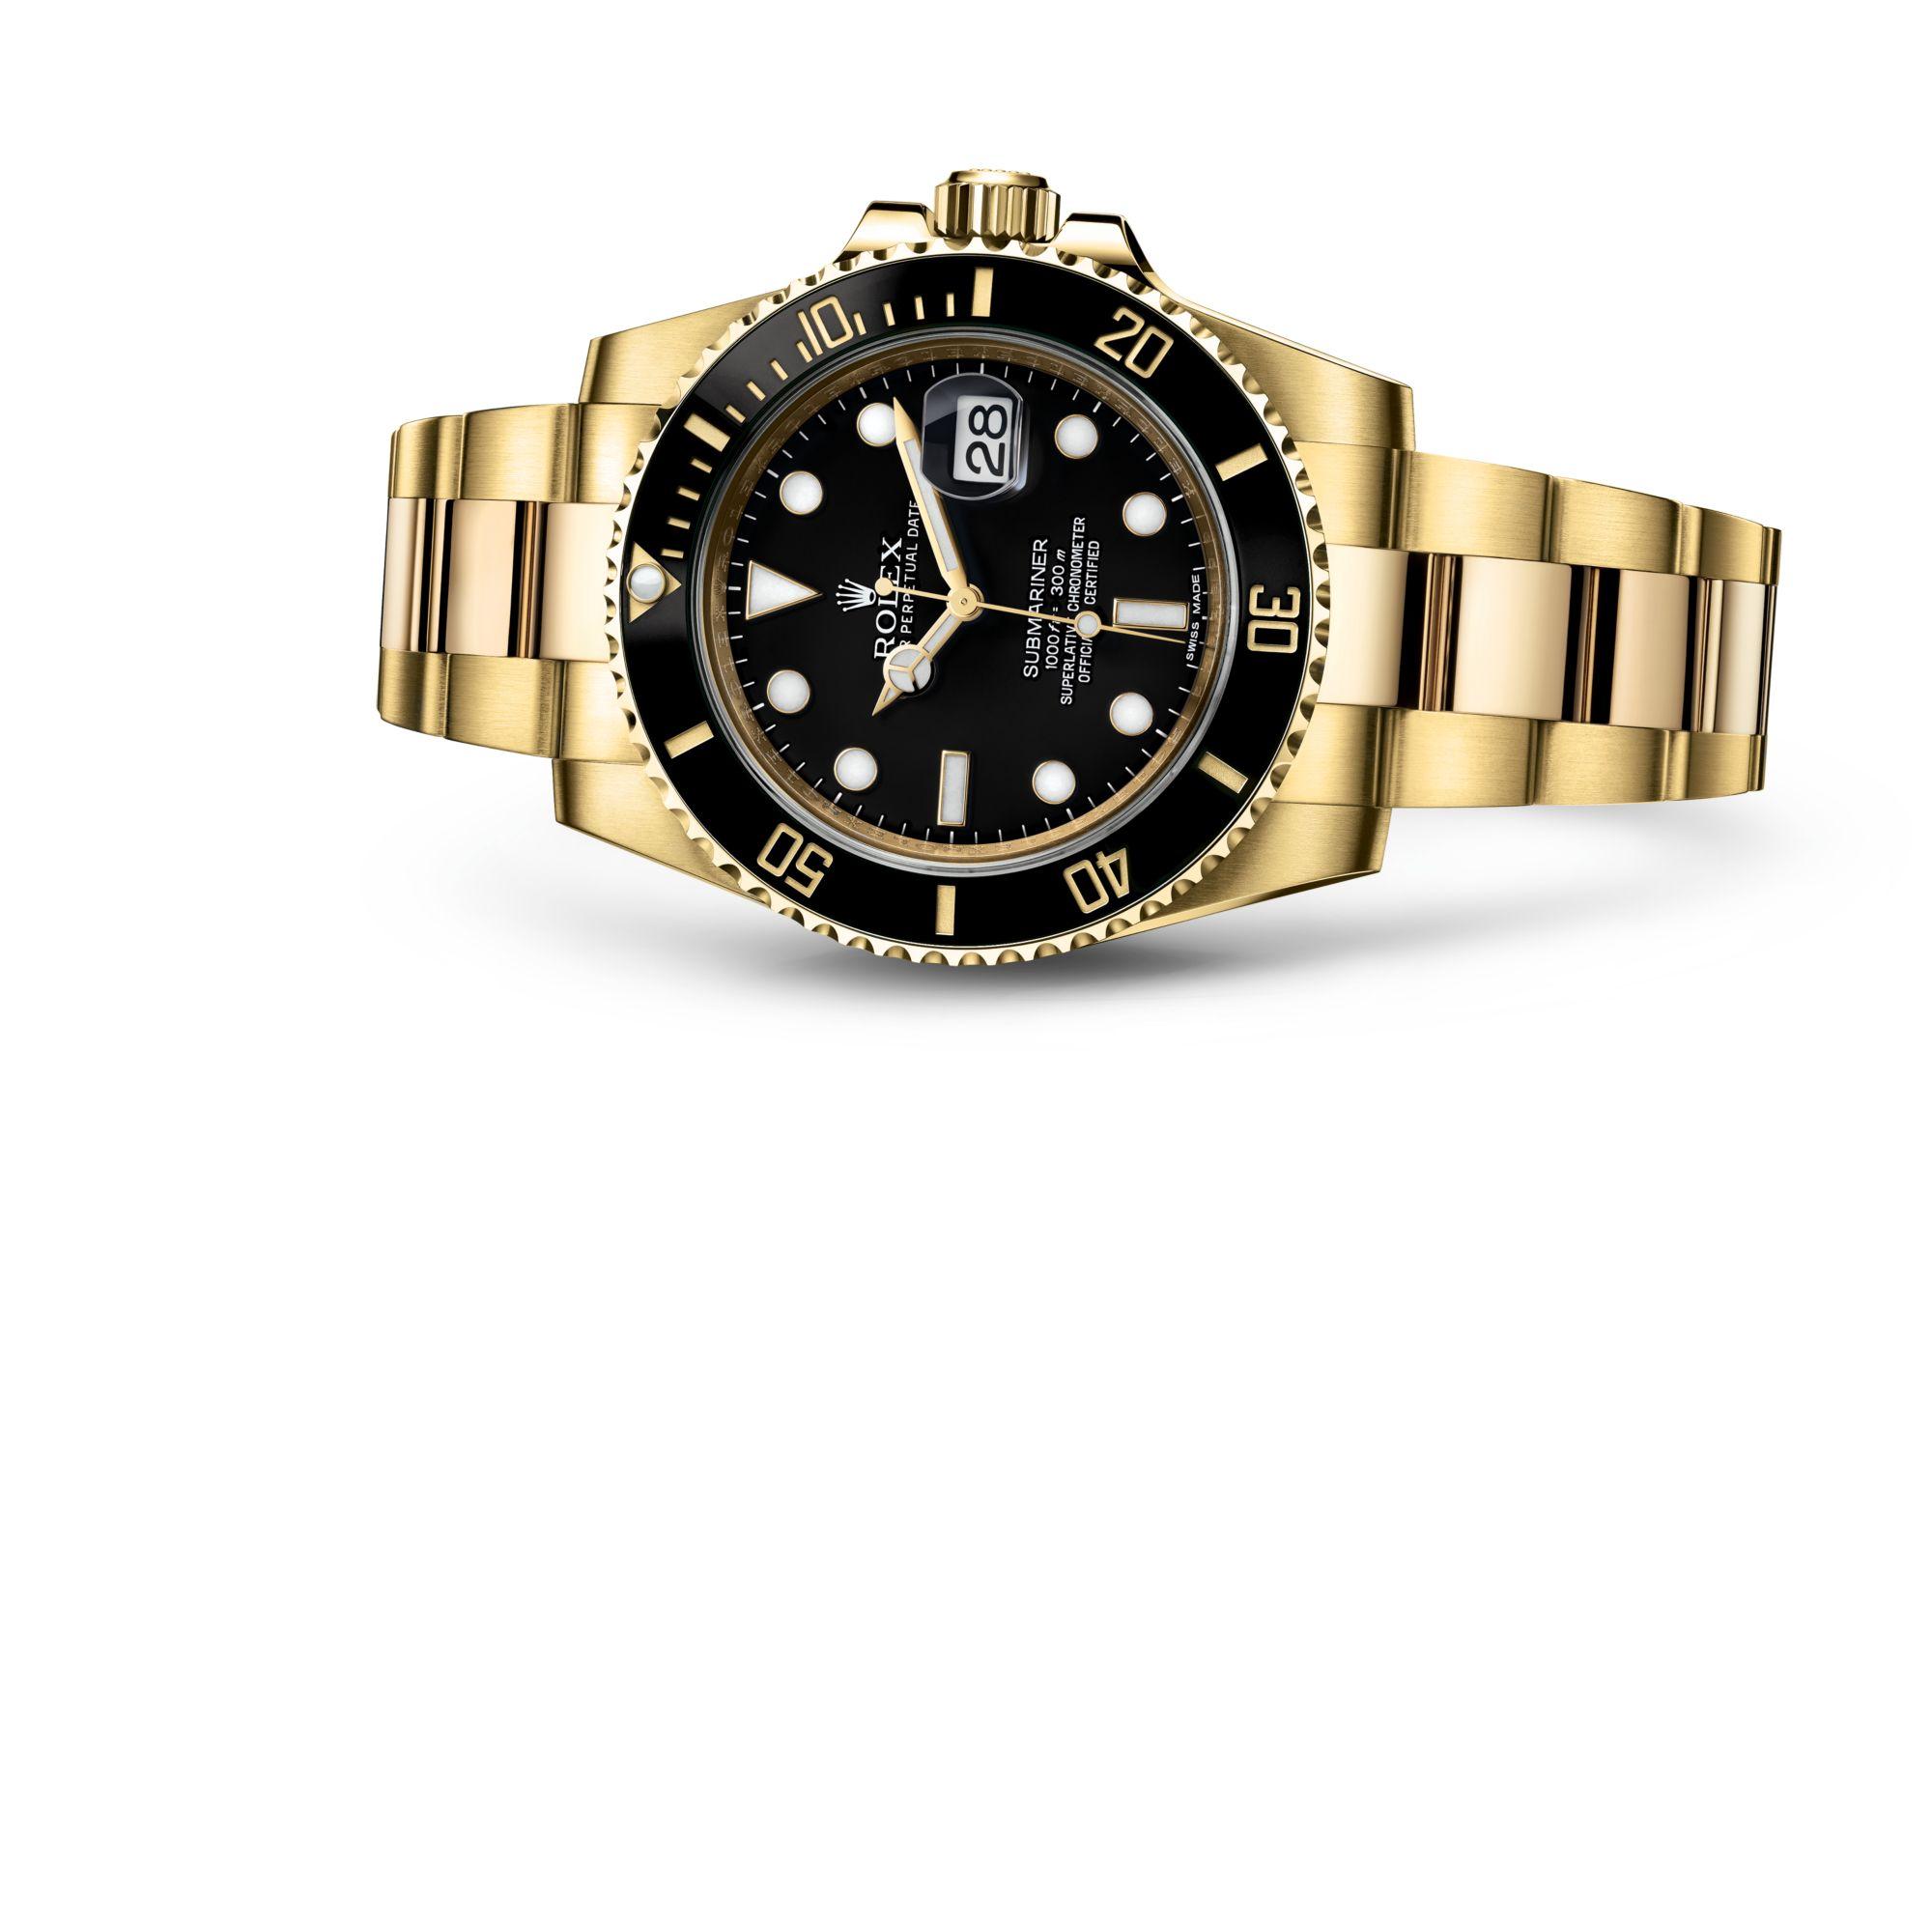 Rolex Submariner Date M116618LN-0001